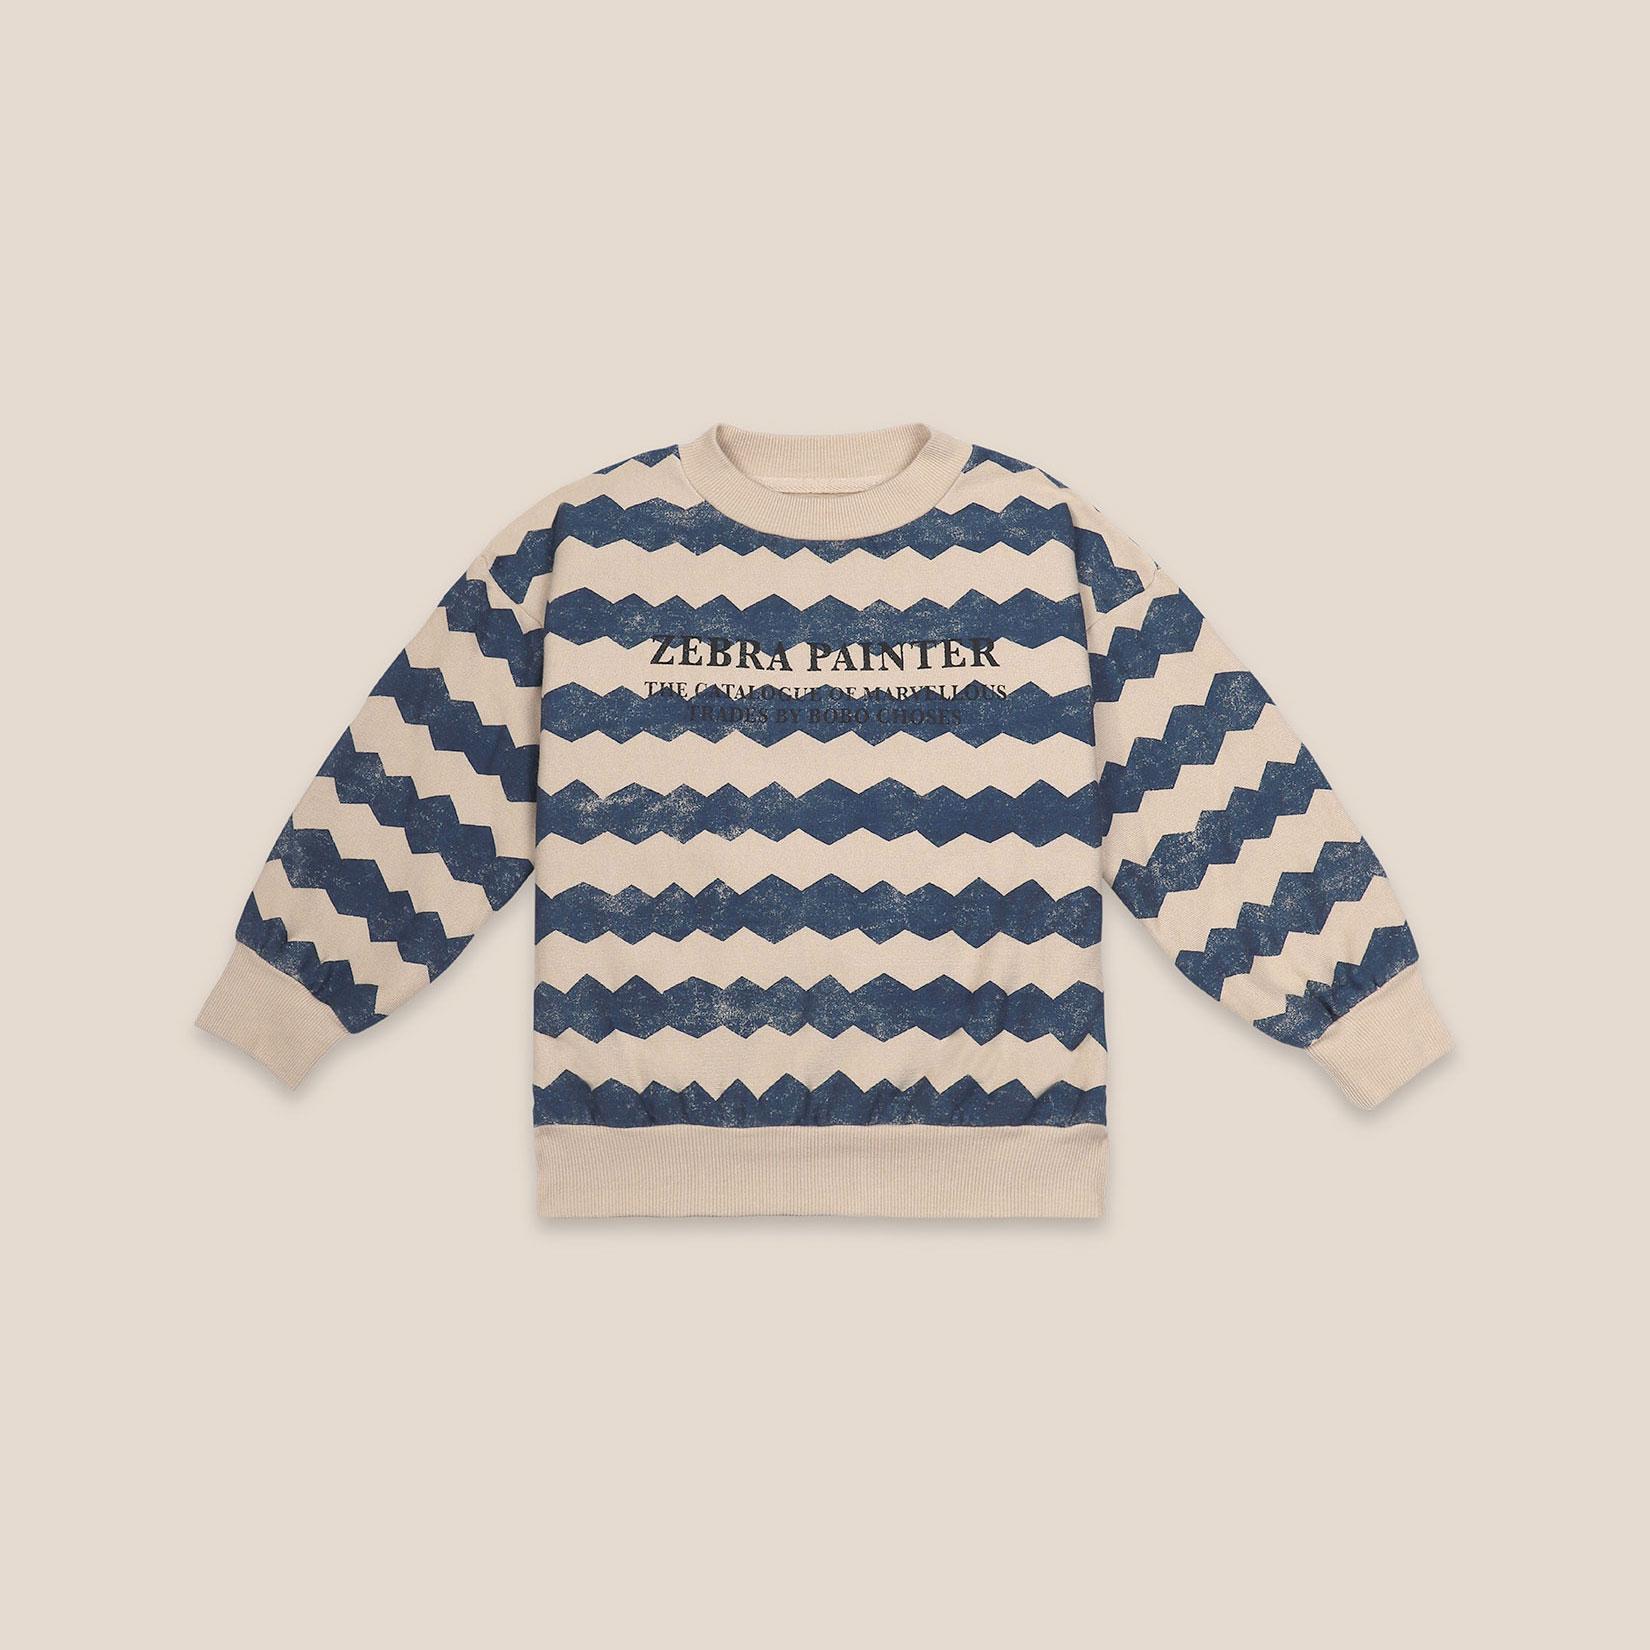 Bobo Choses - Columns Sweatshirt